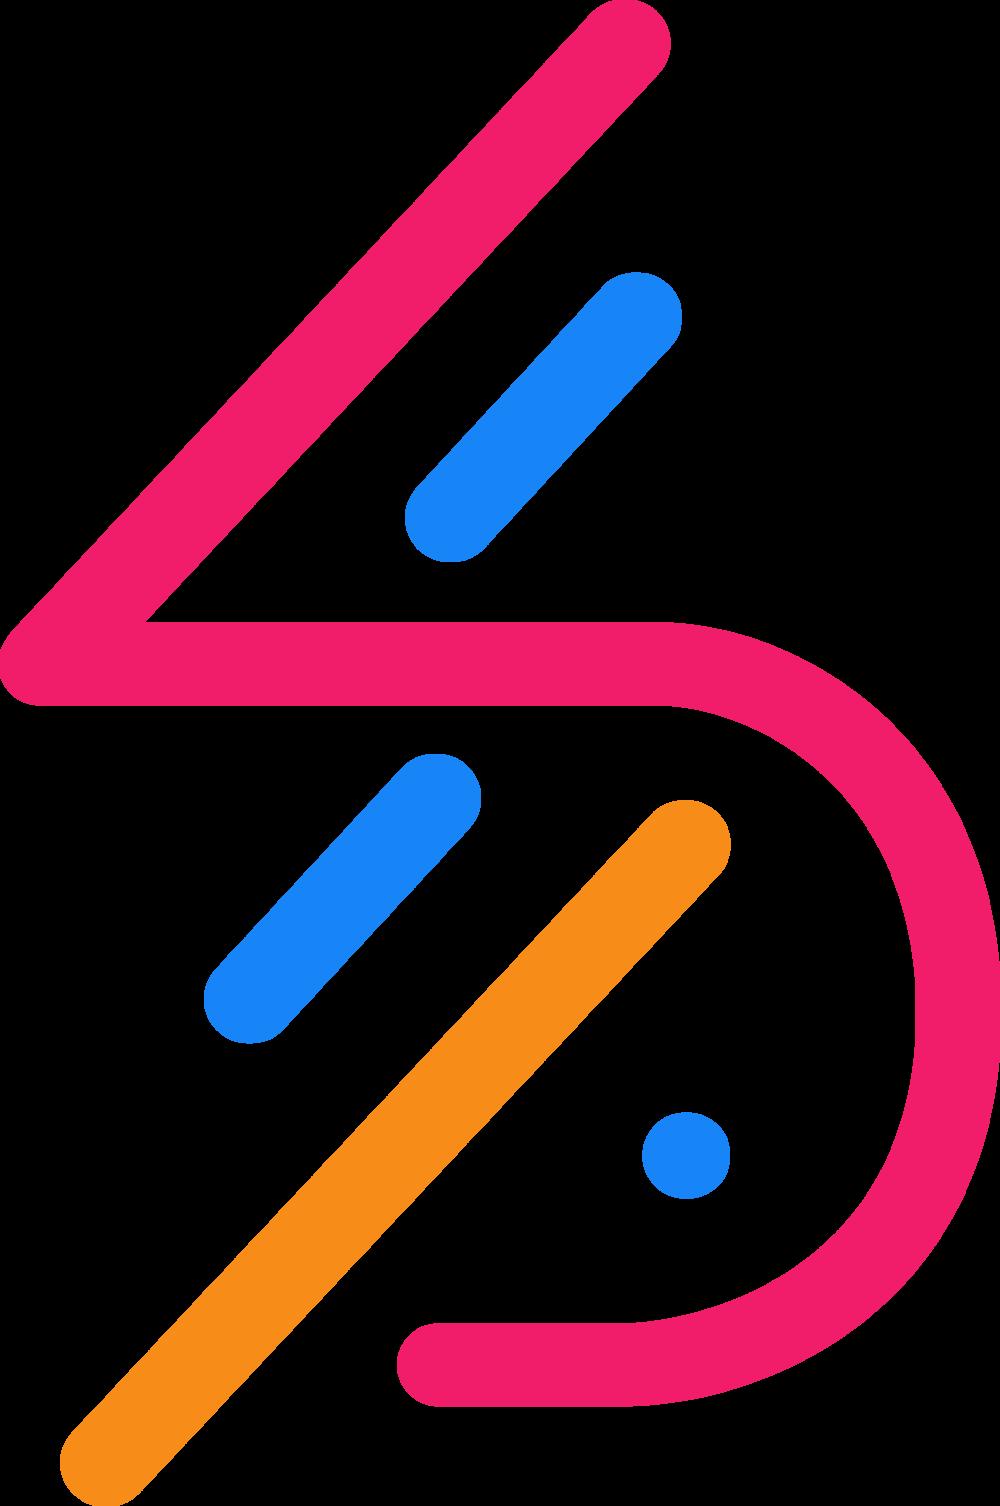 WATF_DataFest_2017.png